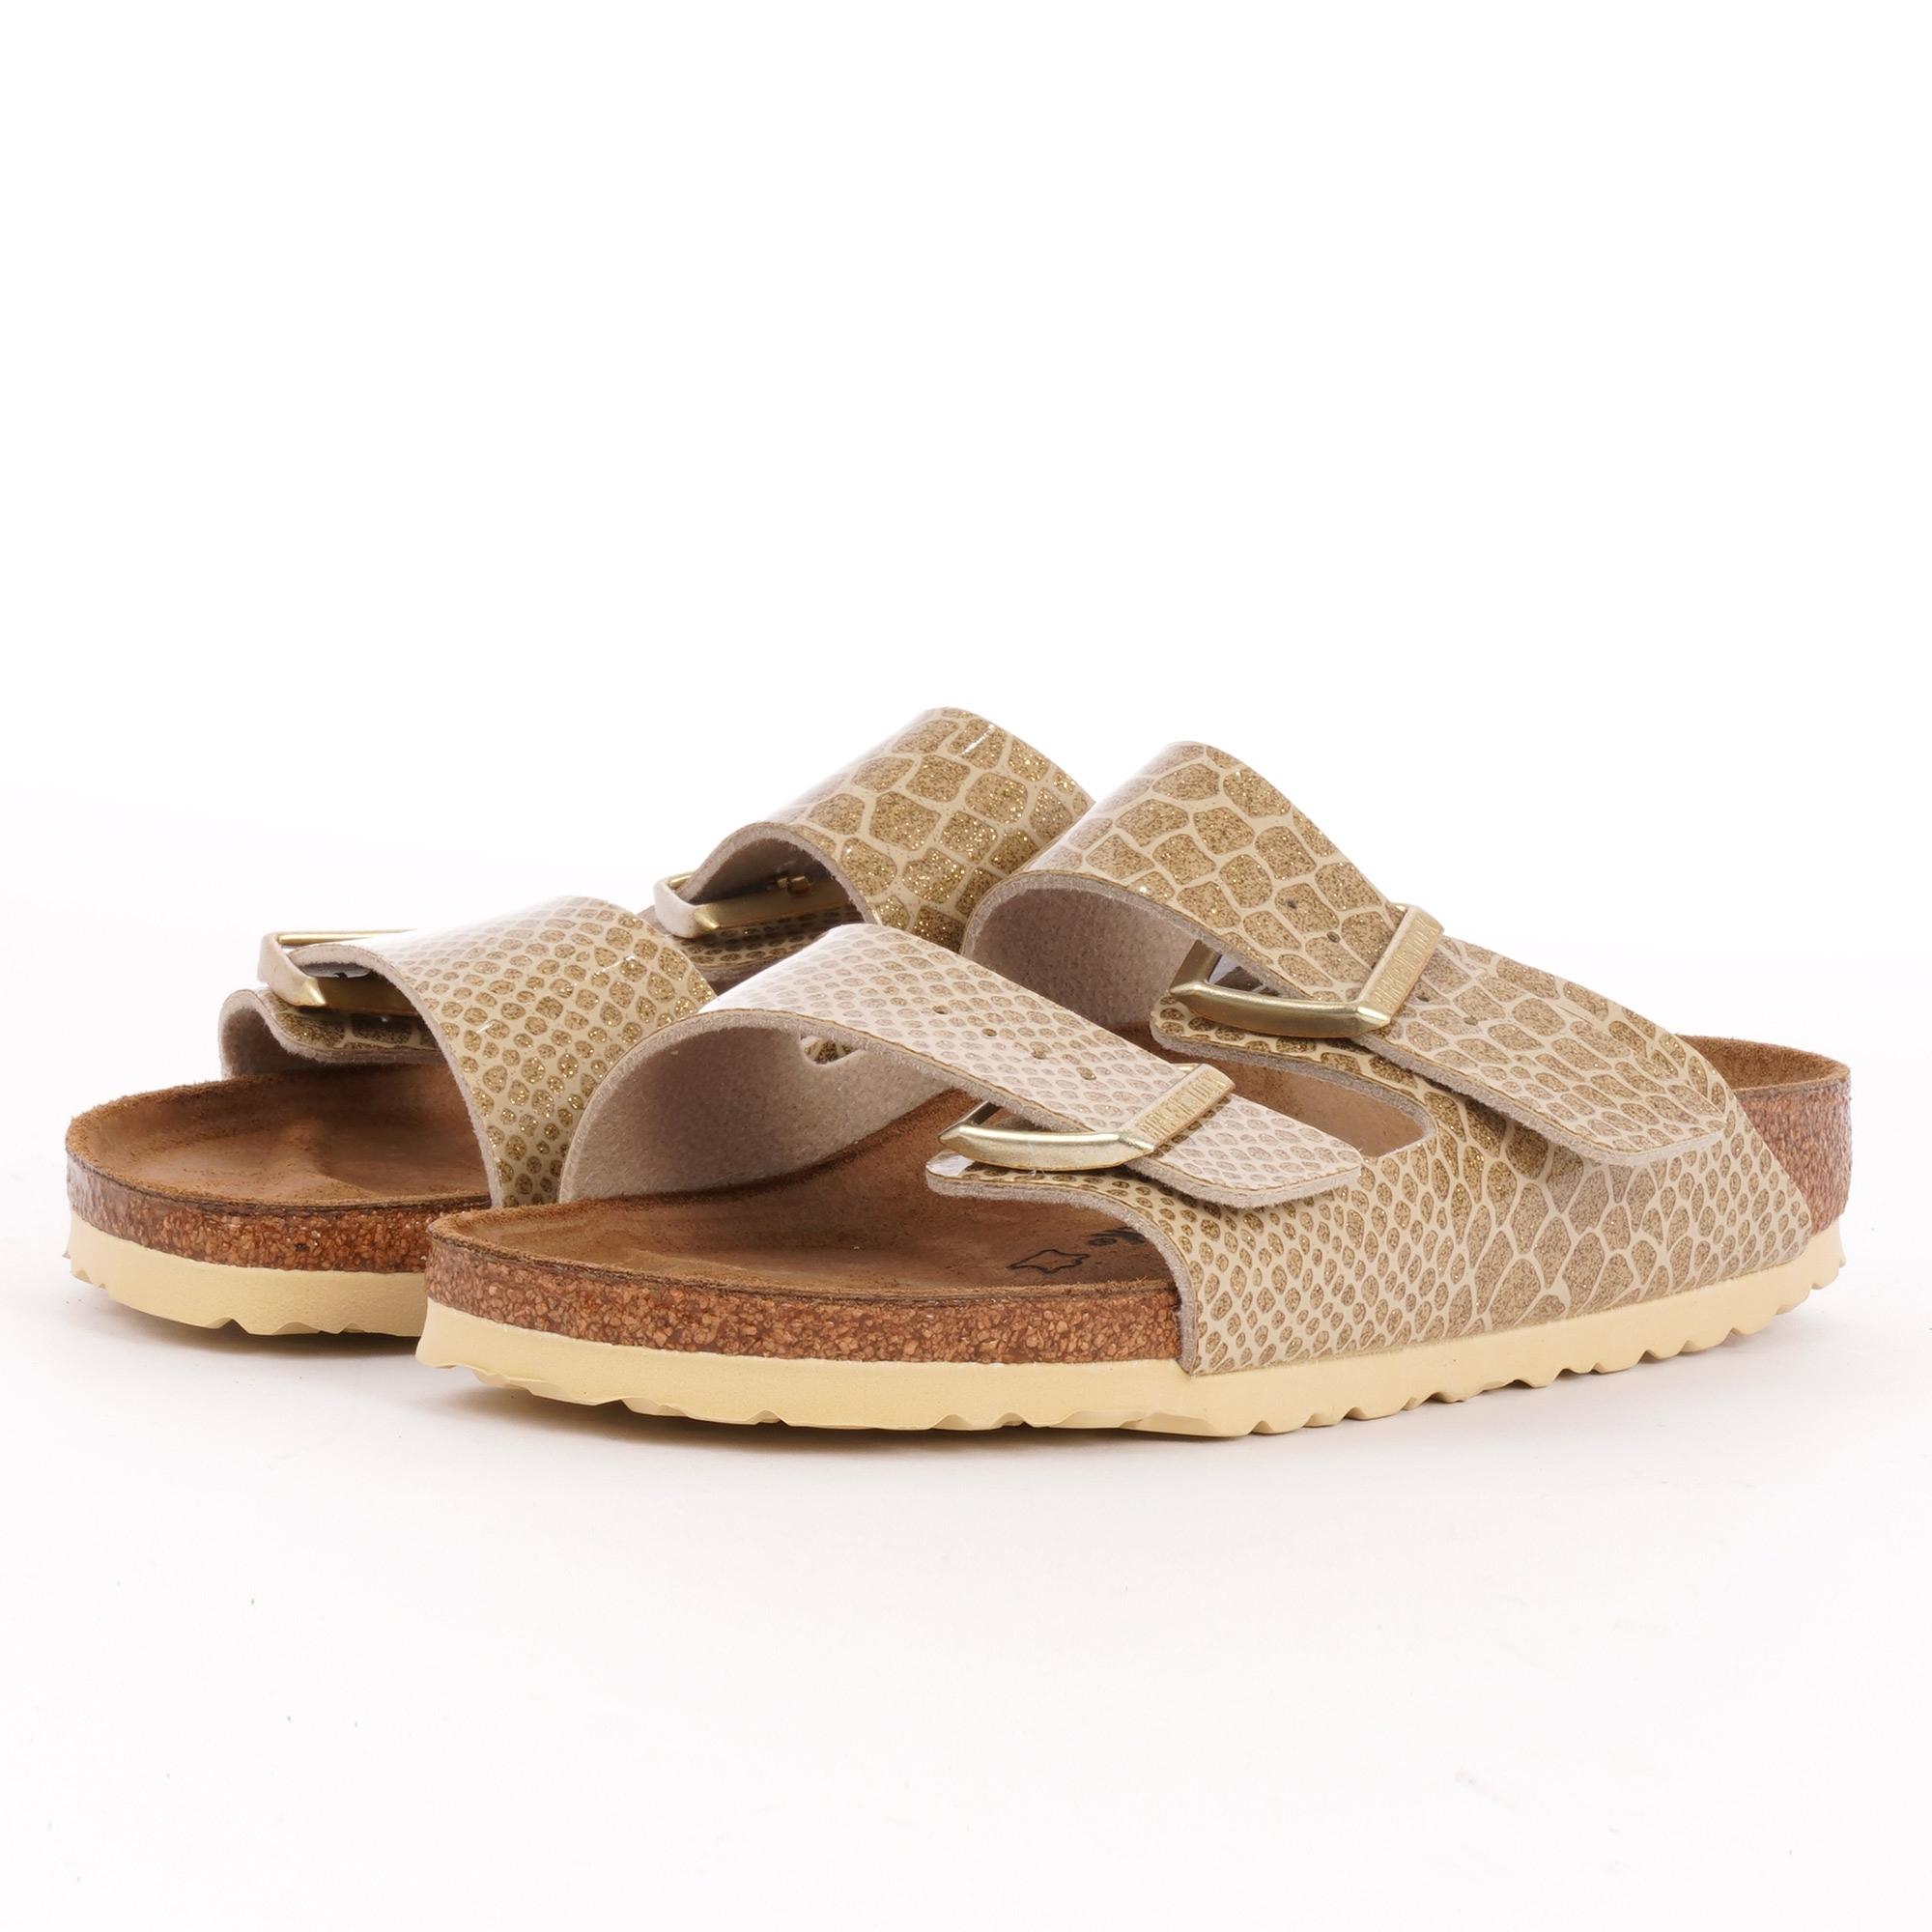 92e95d6758c266 Birkenstock Womens Arizona Sandals